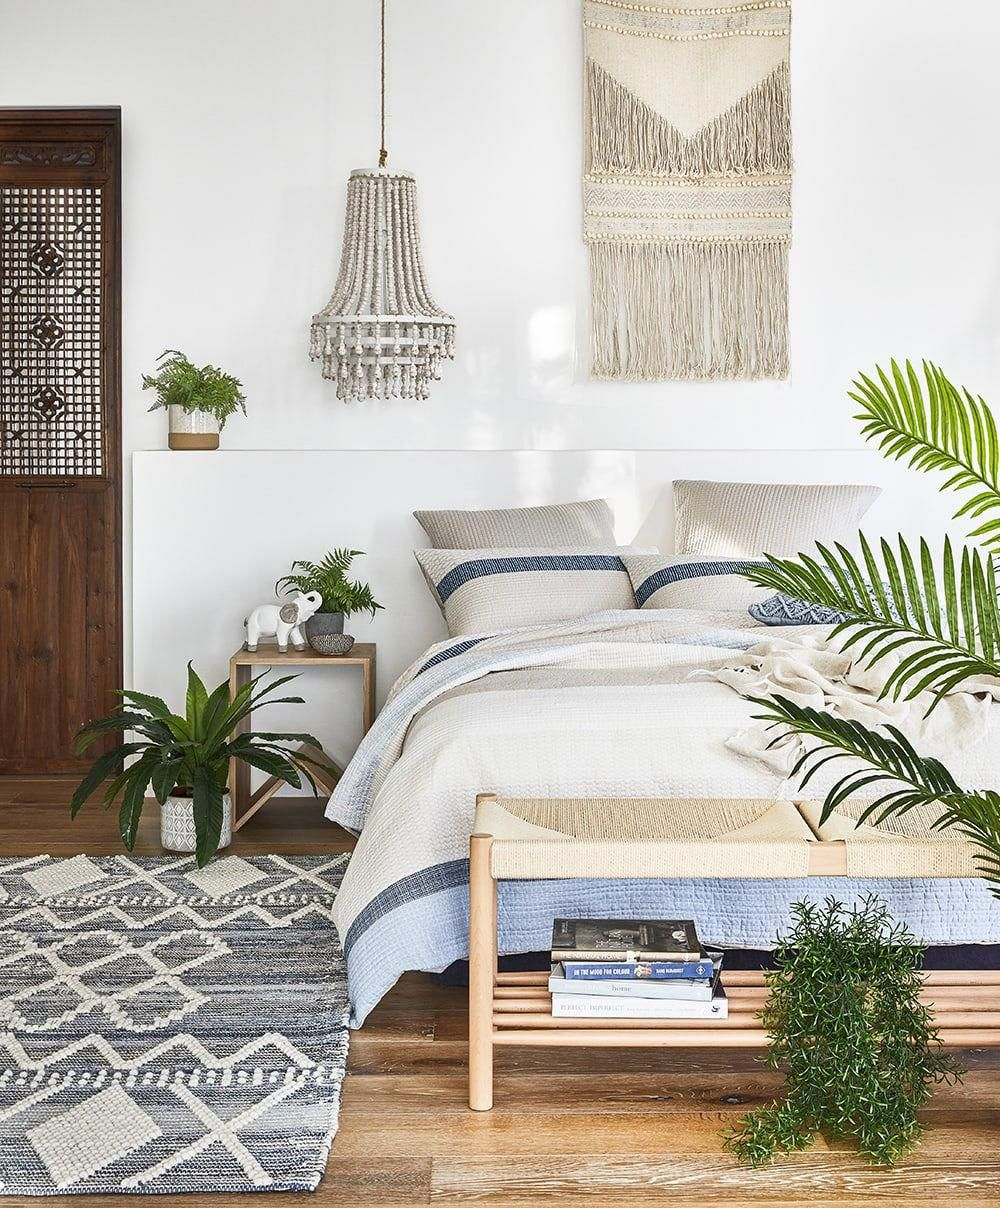 Coastal Bohemian Bedroom With Adairs Fake Plants Bedroom Modern Bedroom Decor Bedroom Diy Bedroom Design